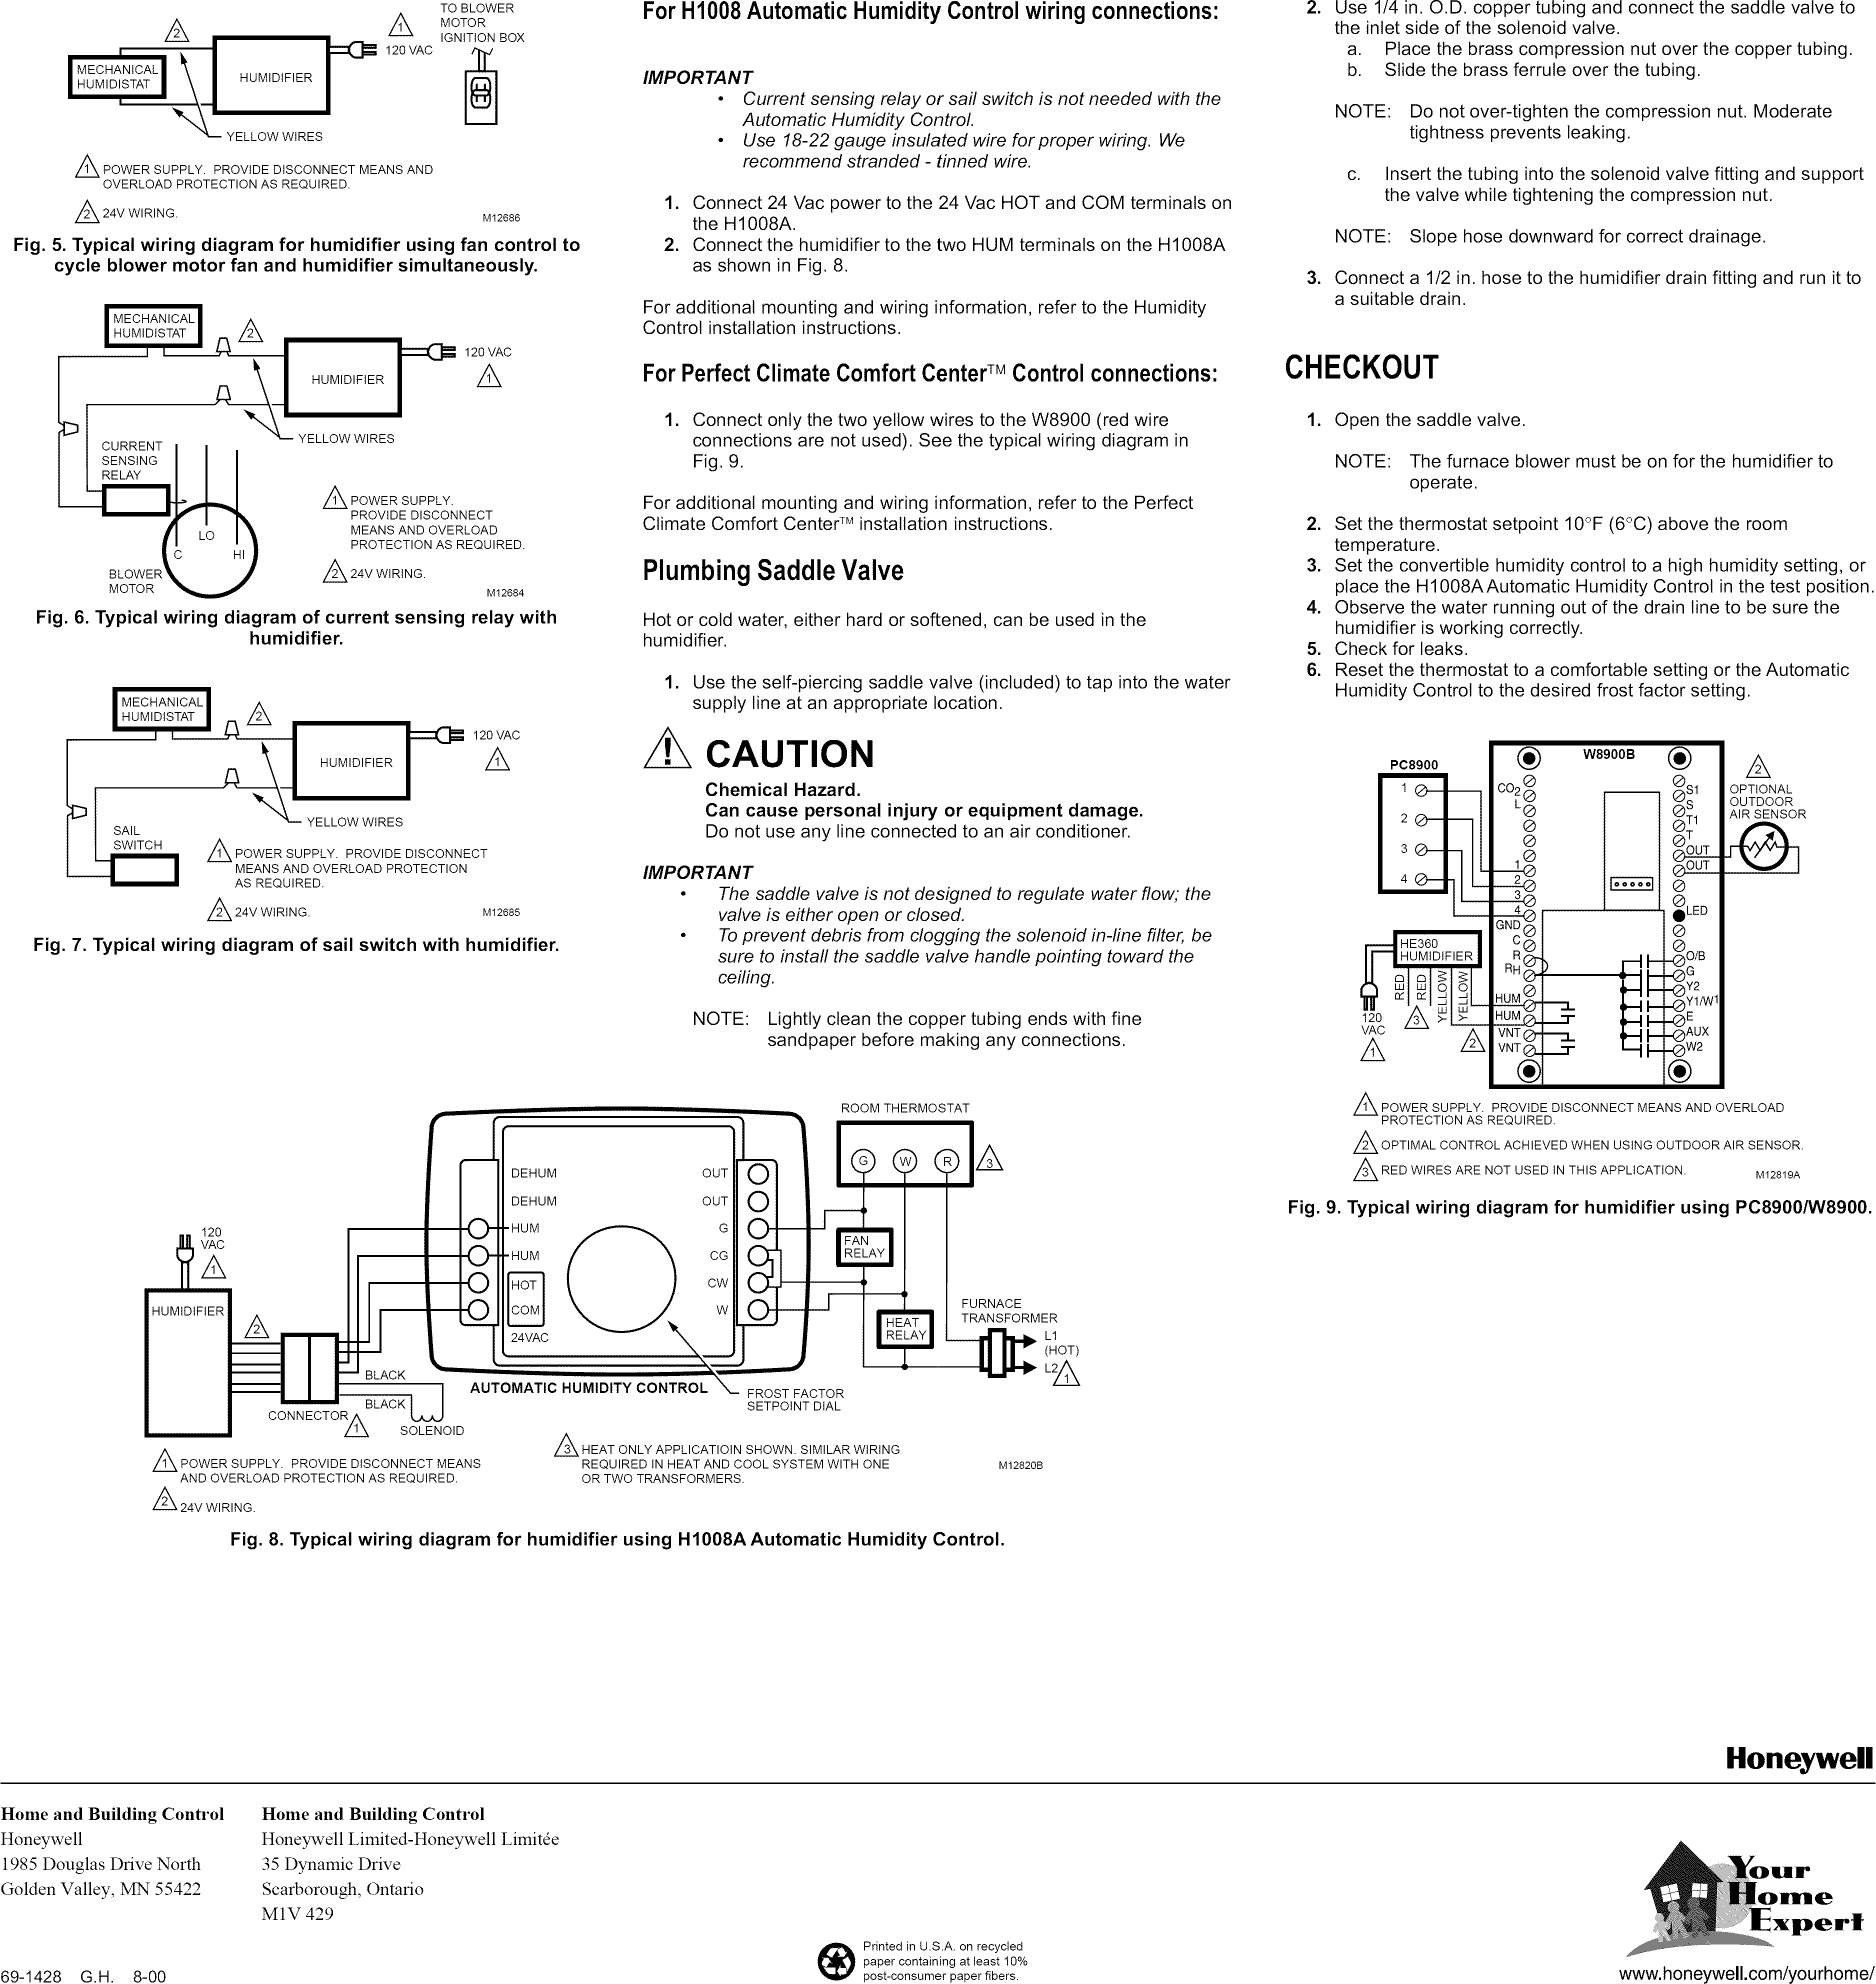 Mbb Interlift Wiring Diagram 2005 Trx450r Kicker 12 Wanco